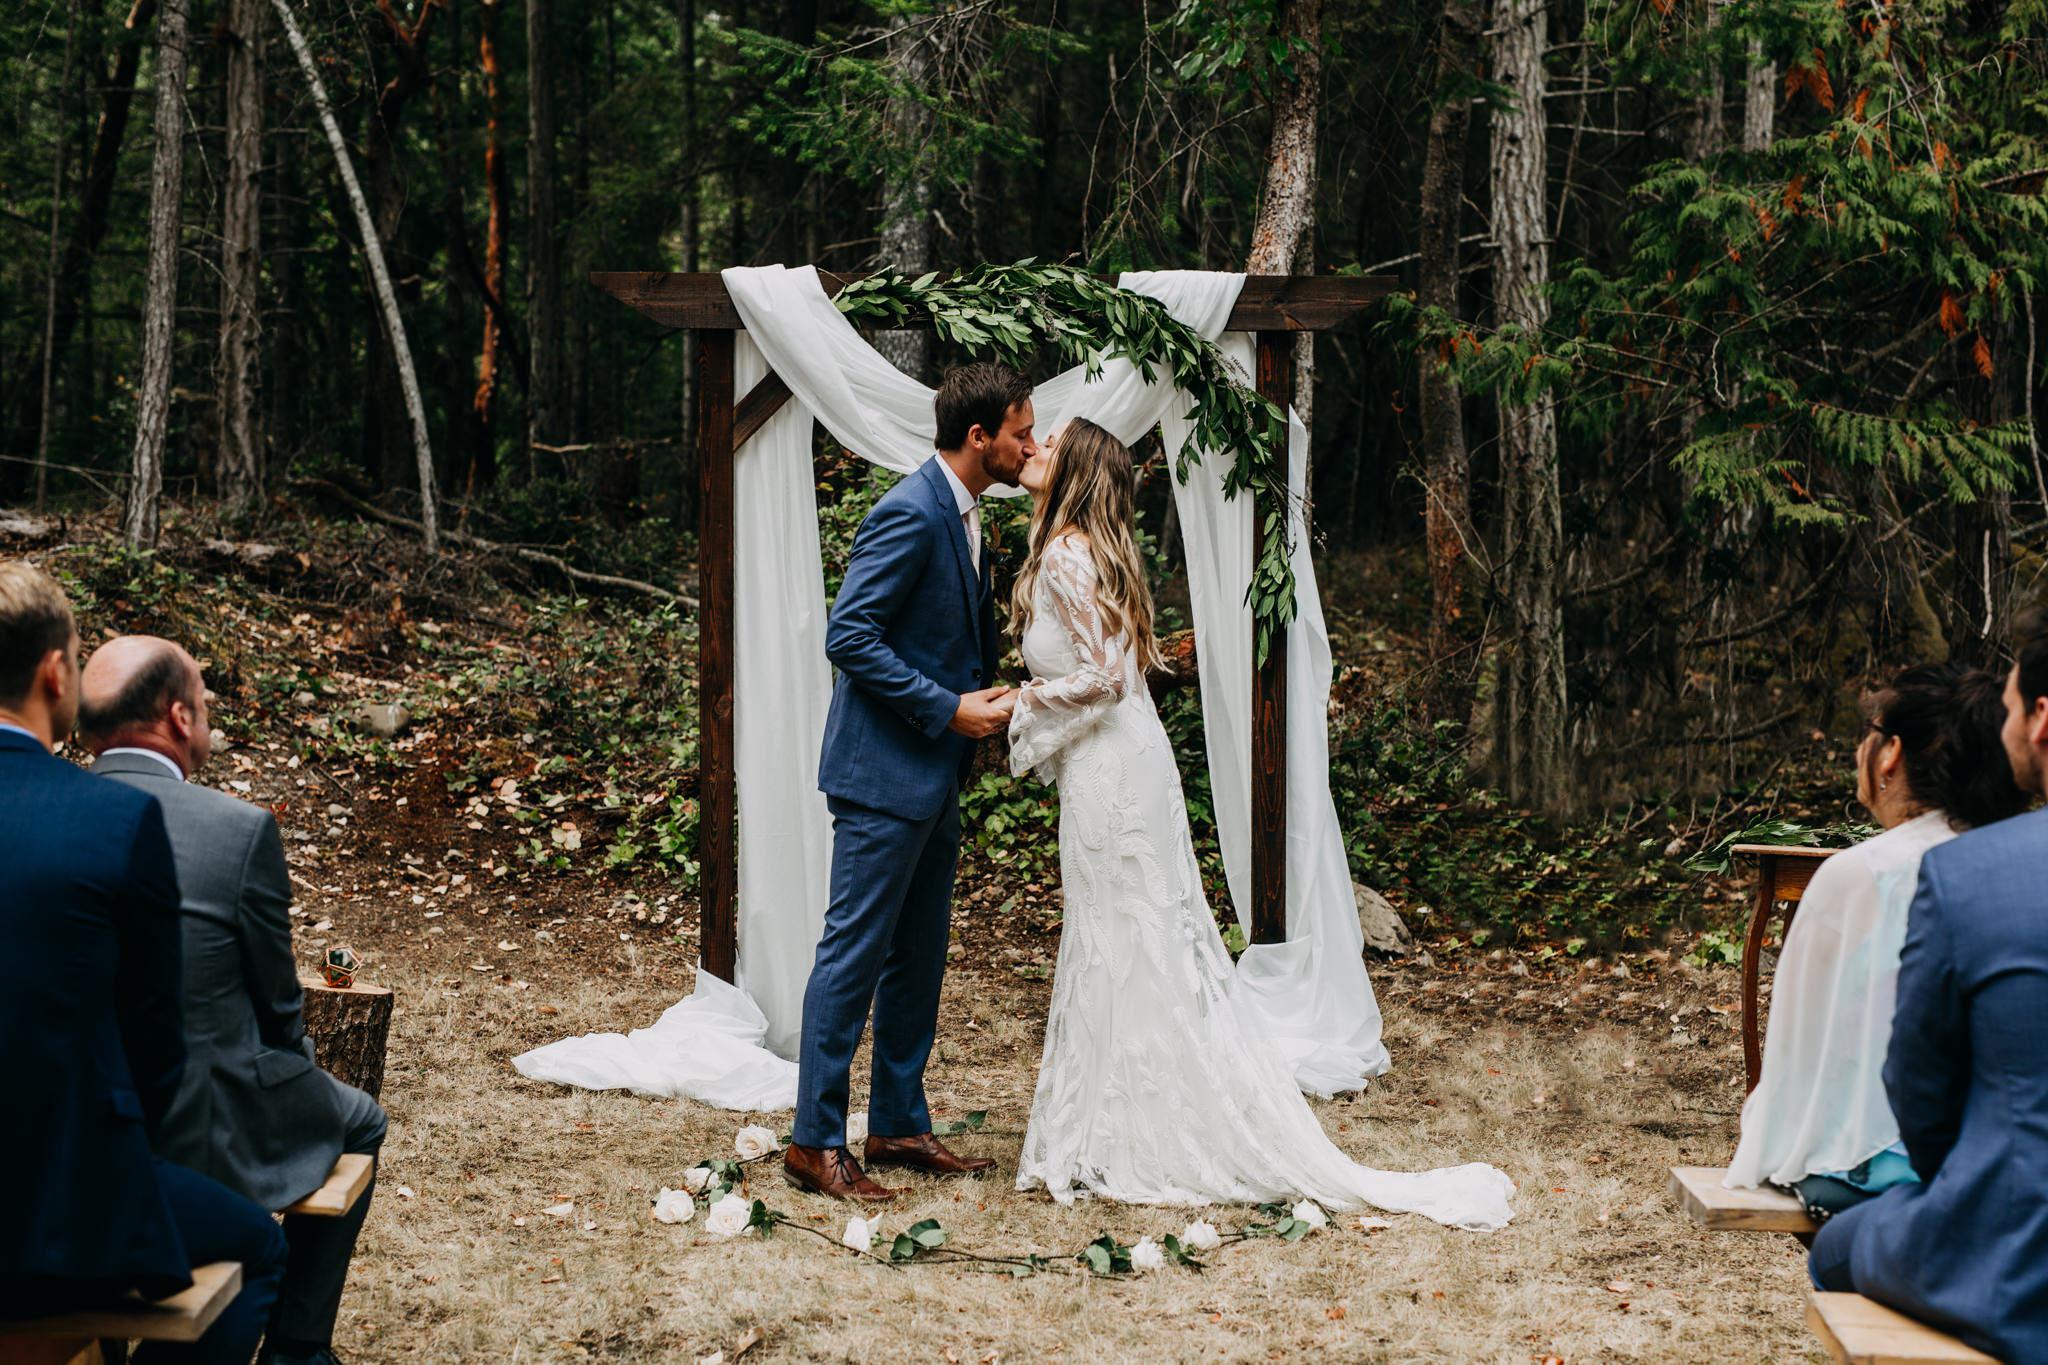 mona-rylan-mayne-island-wedding-aileen-choi-photo-web-517.jpg